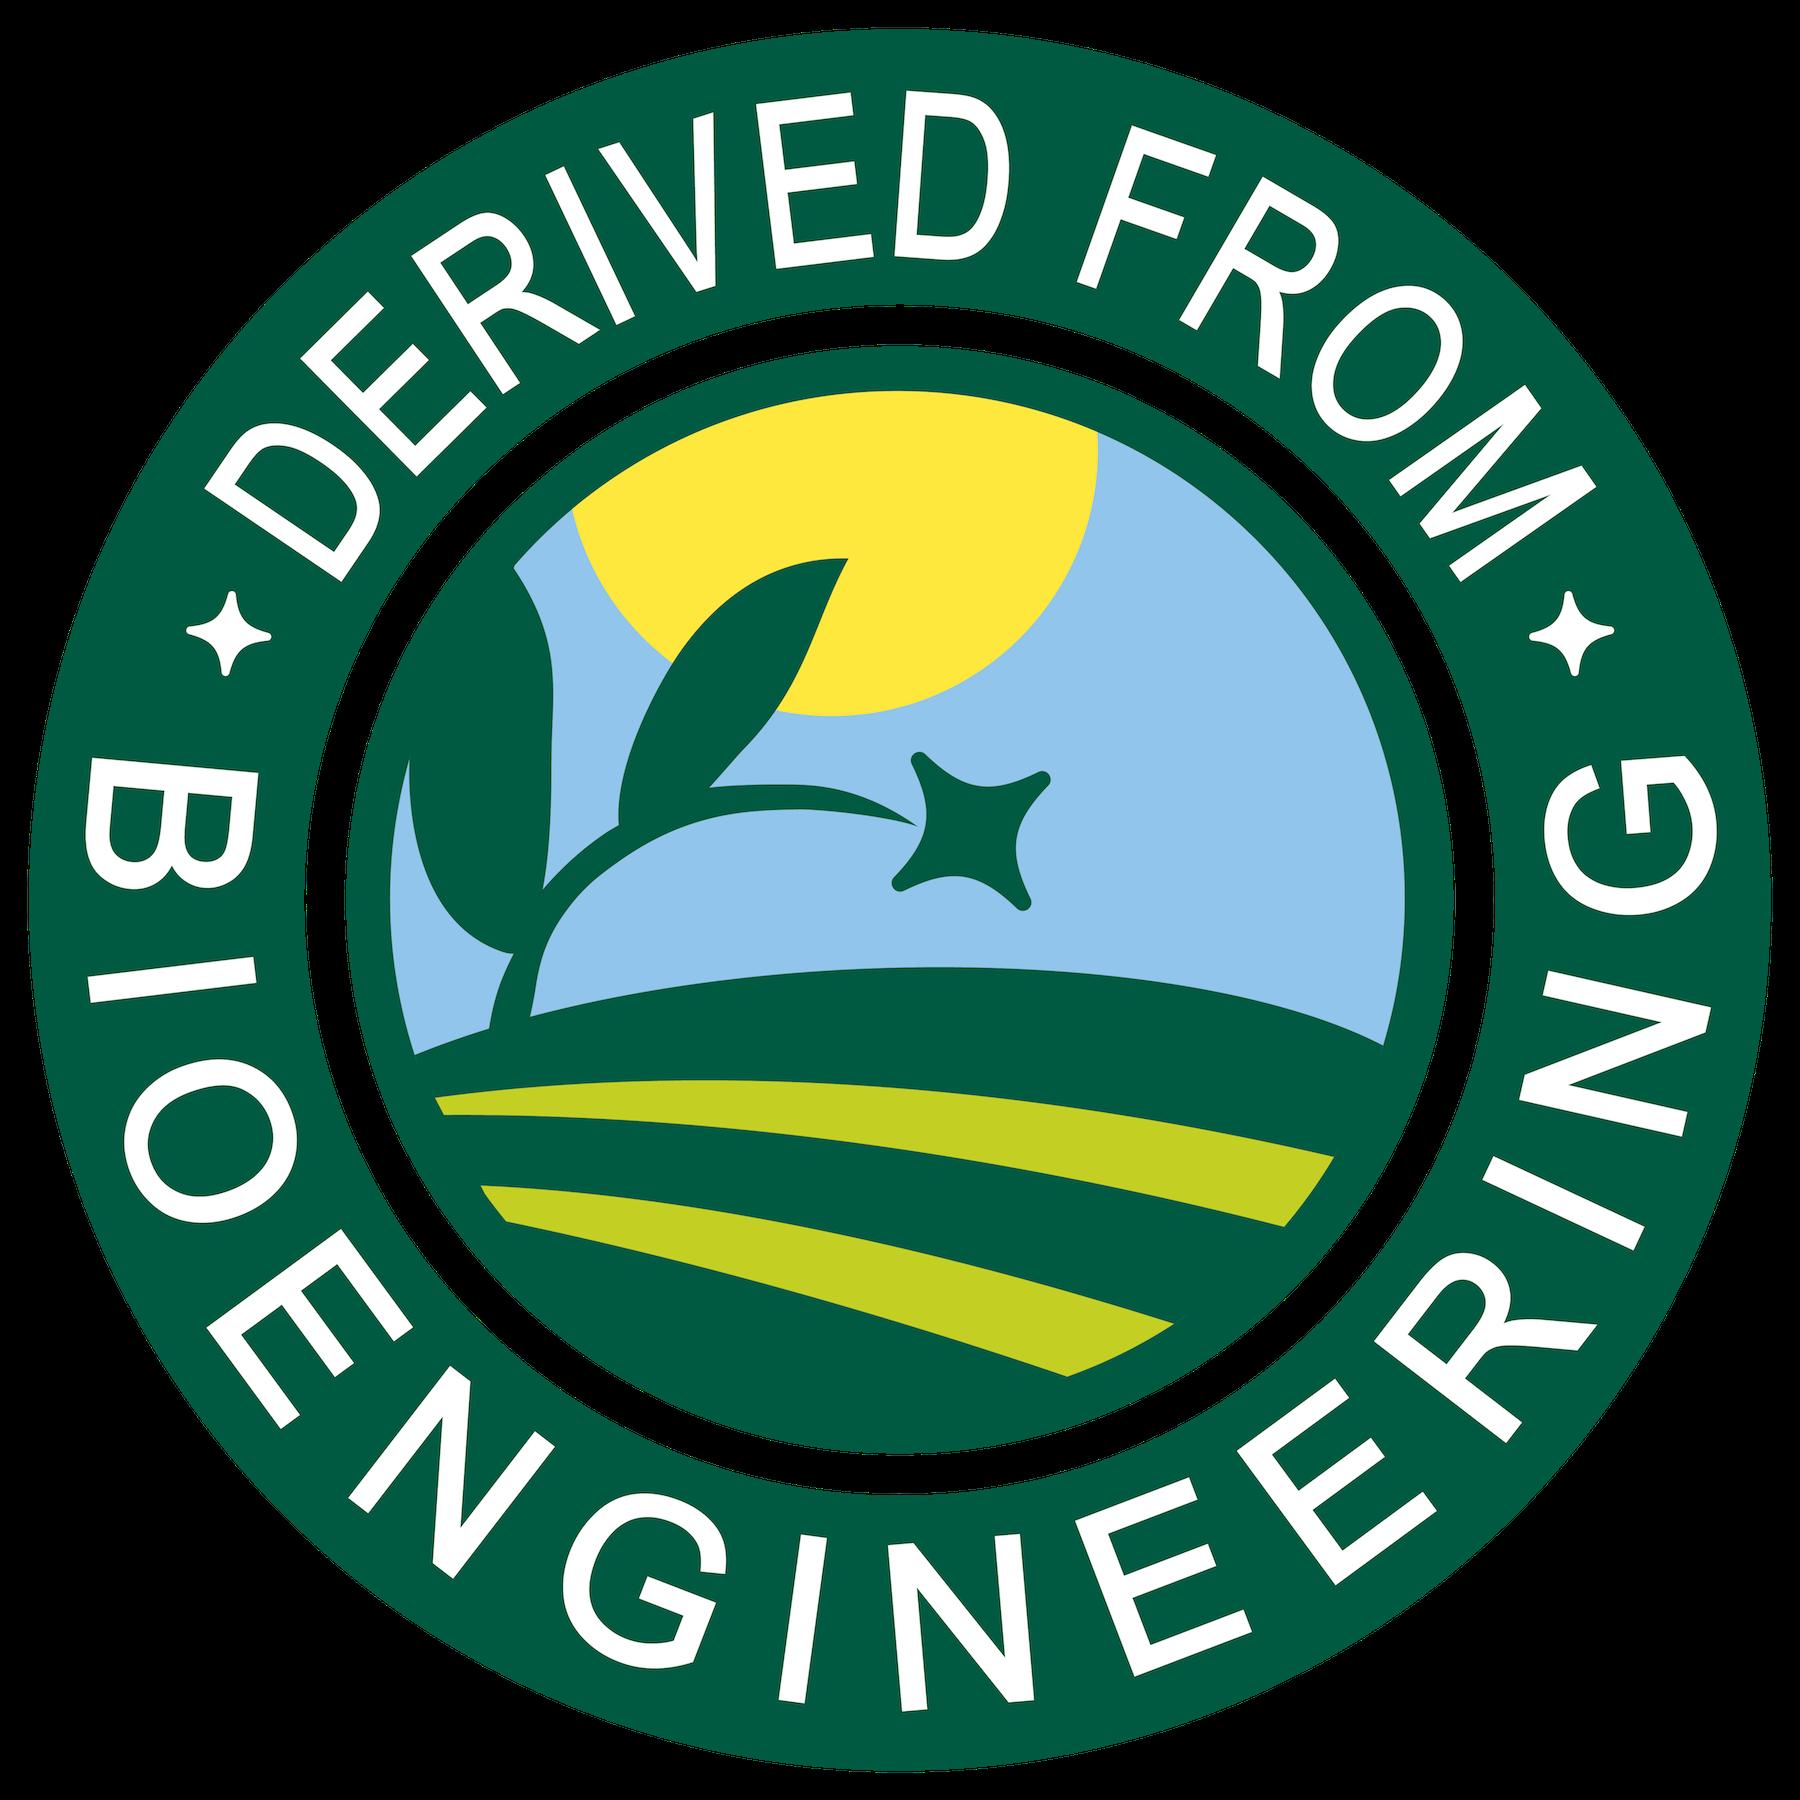 Derived from Bioengineering USDA GMO label